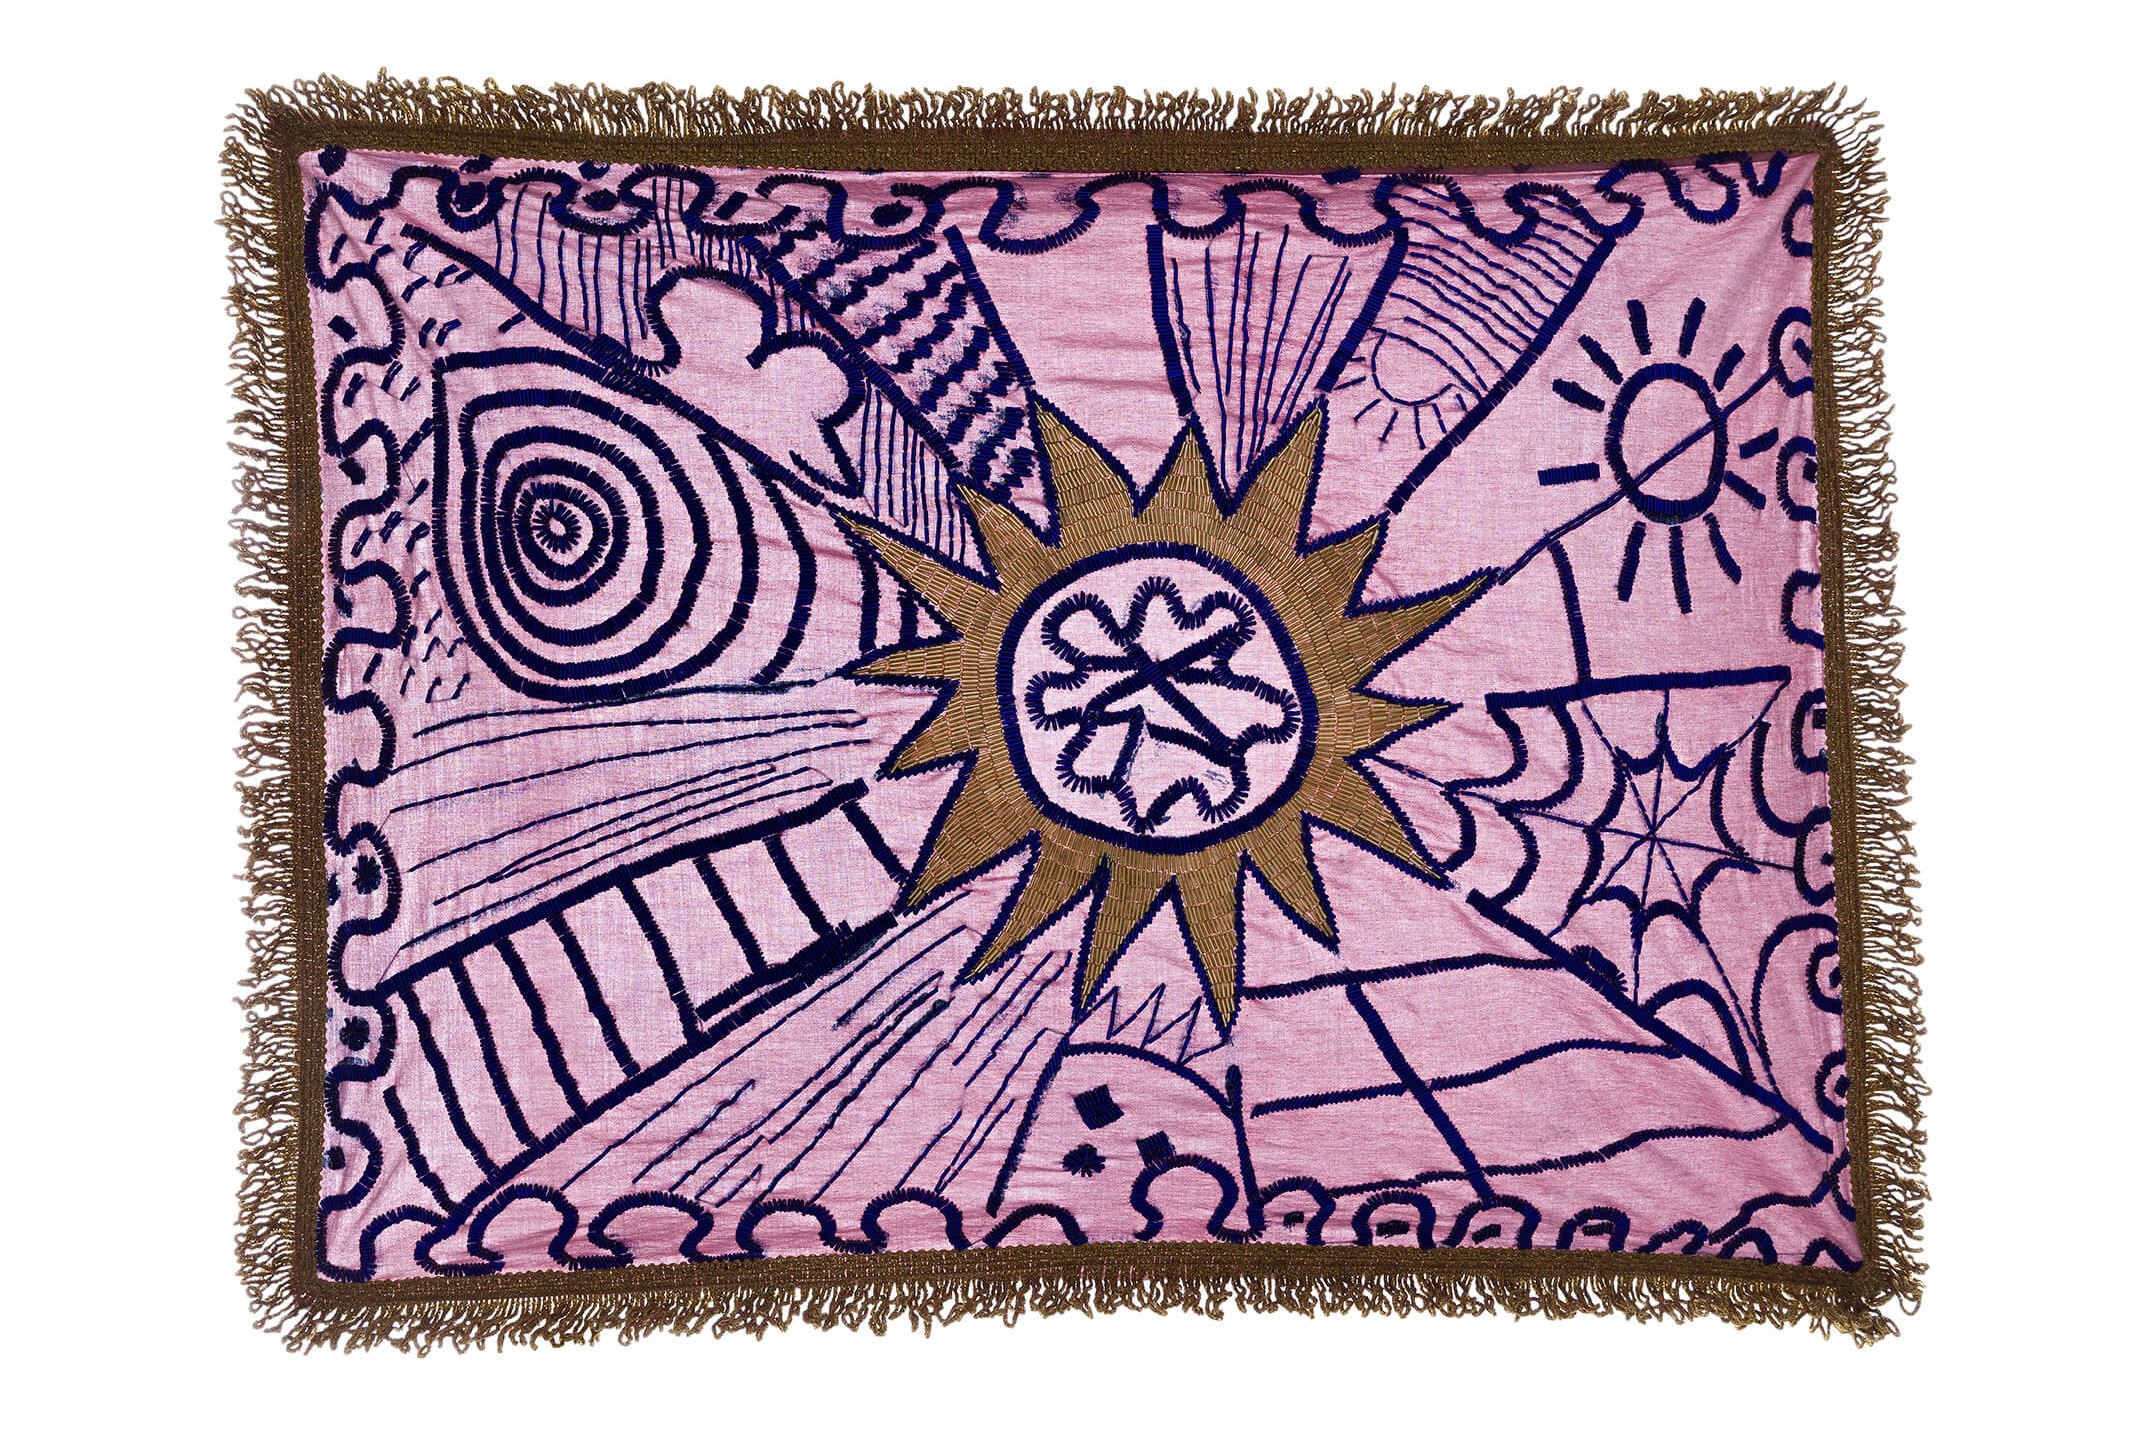 Adriano Costa,<em>Sad Samba</em>, 2015,embroidery on bed sheet piece,15 × 78 × 52 cm - Mendes Wood DM